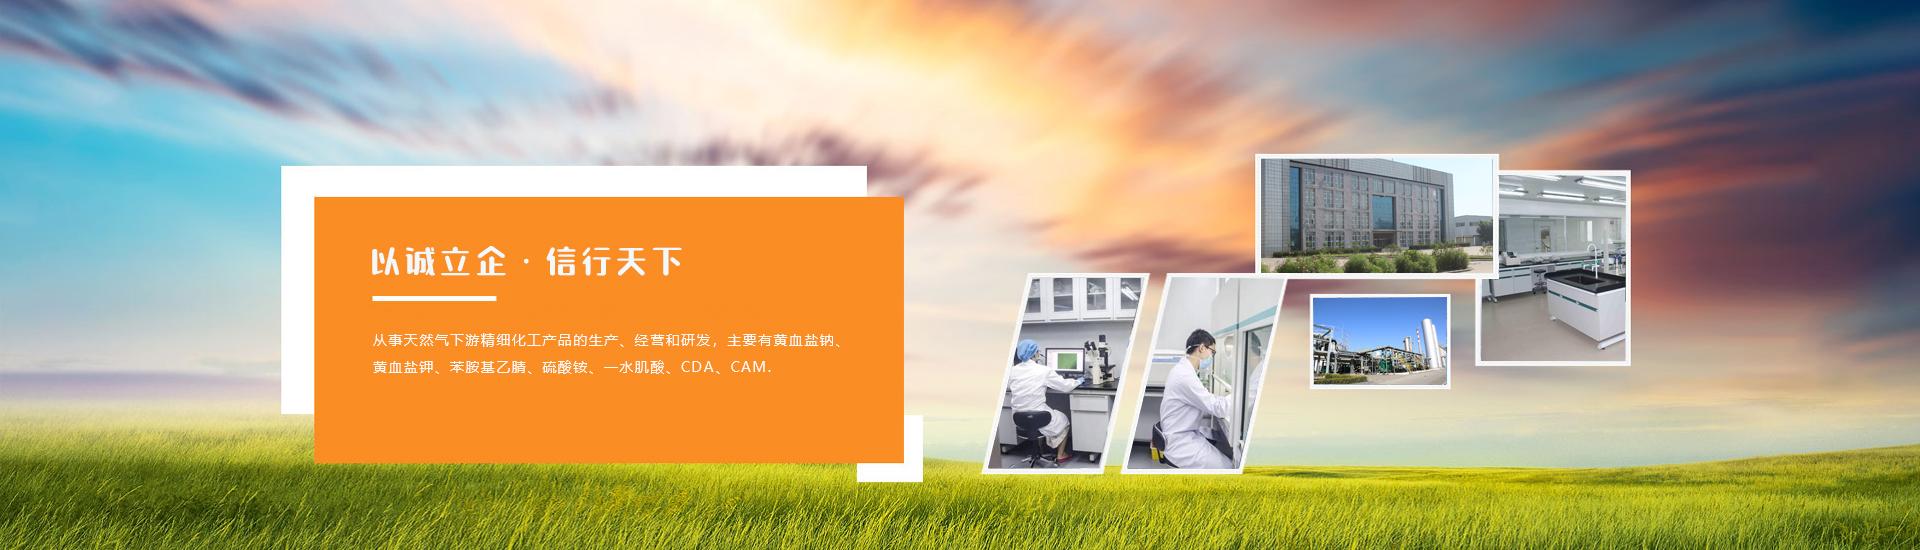 http://www.chengxinyongan.com/data/upload/202103/20210317141439_367.jpg